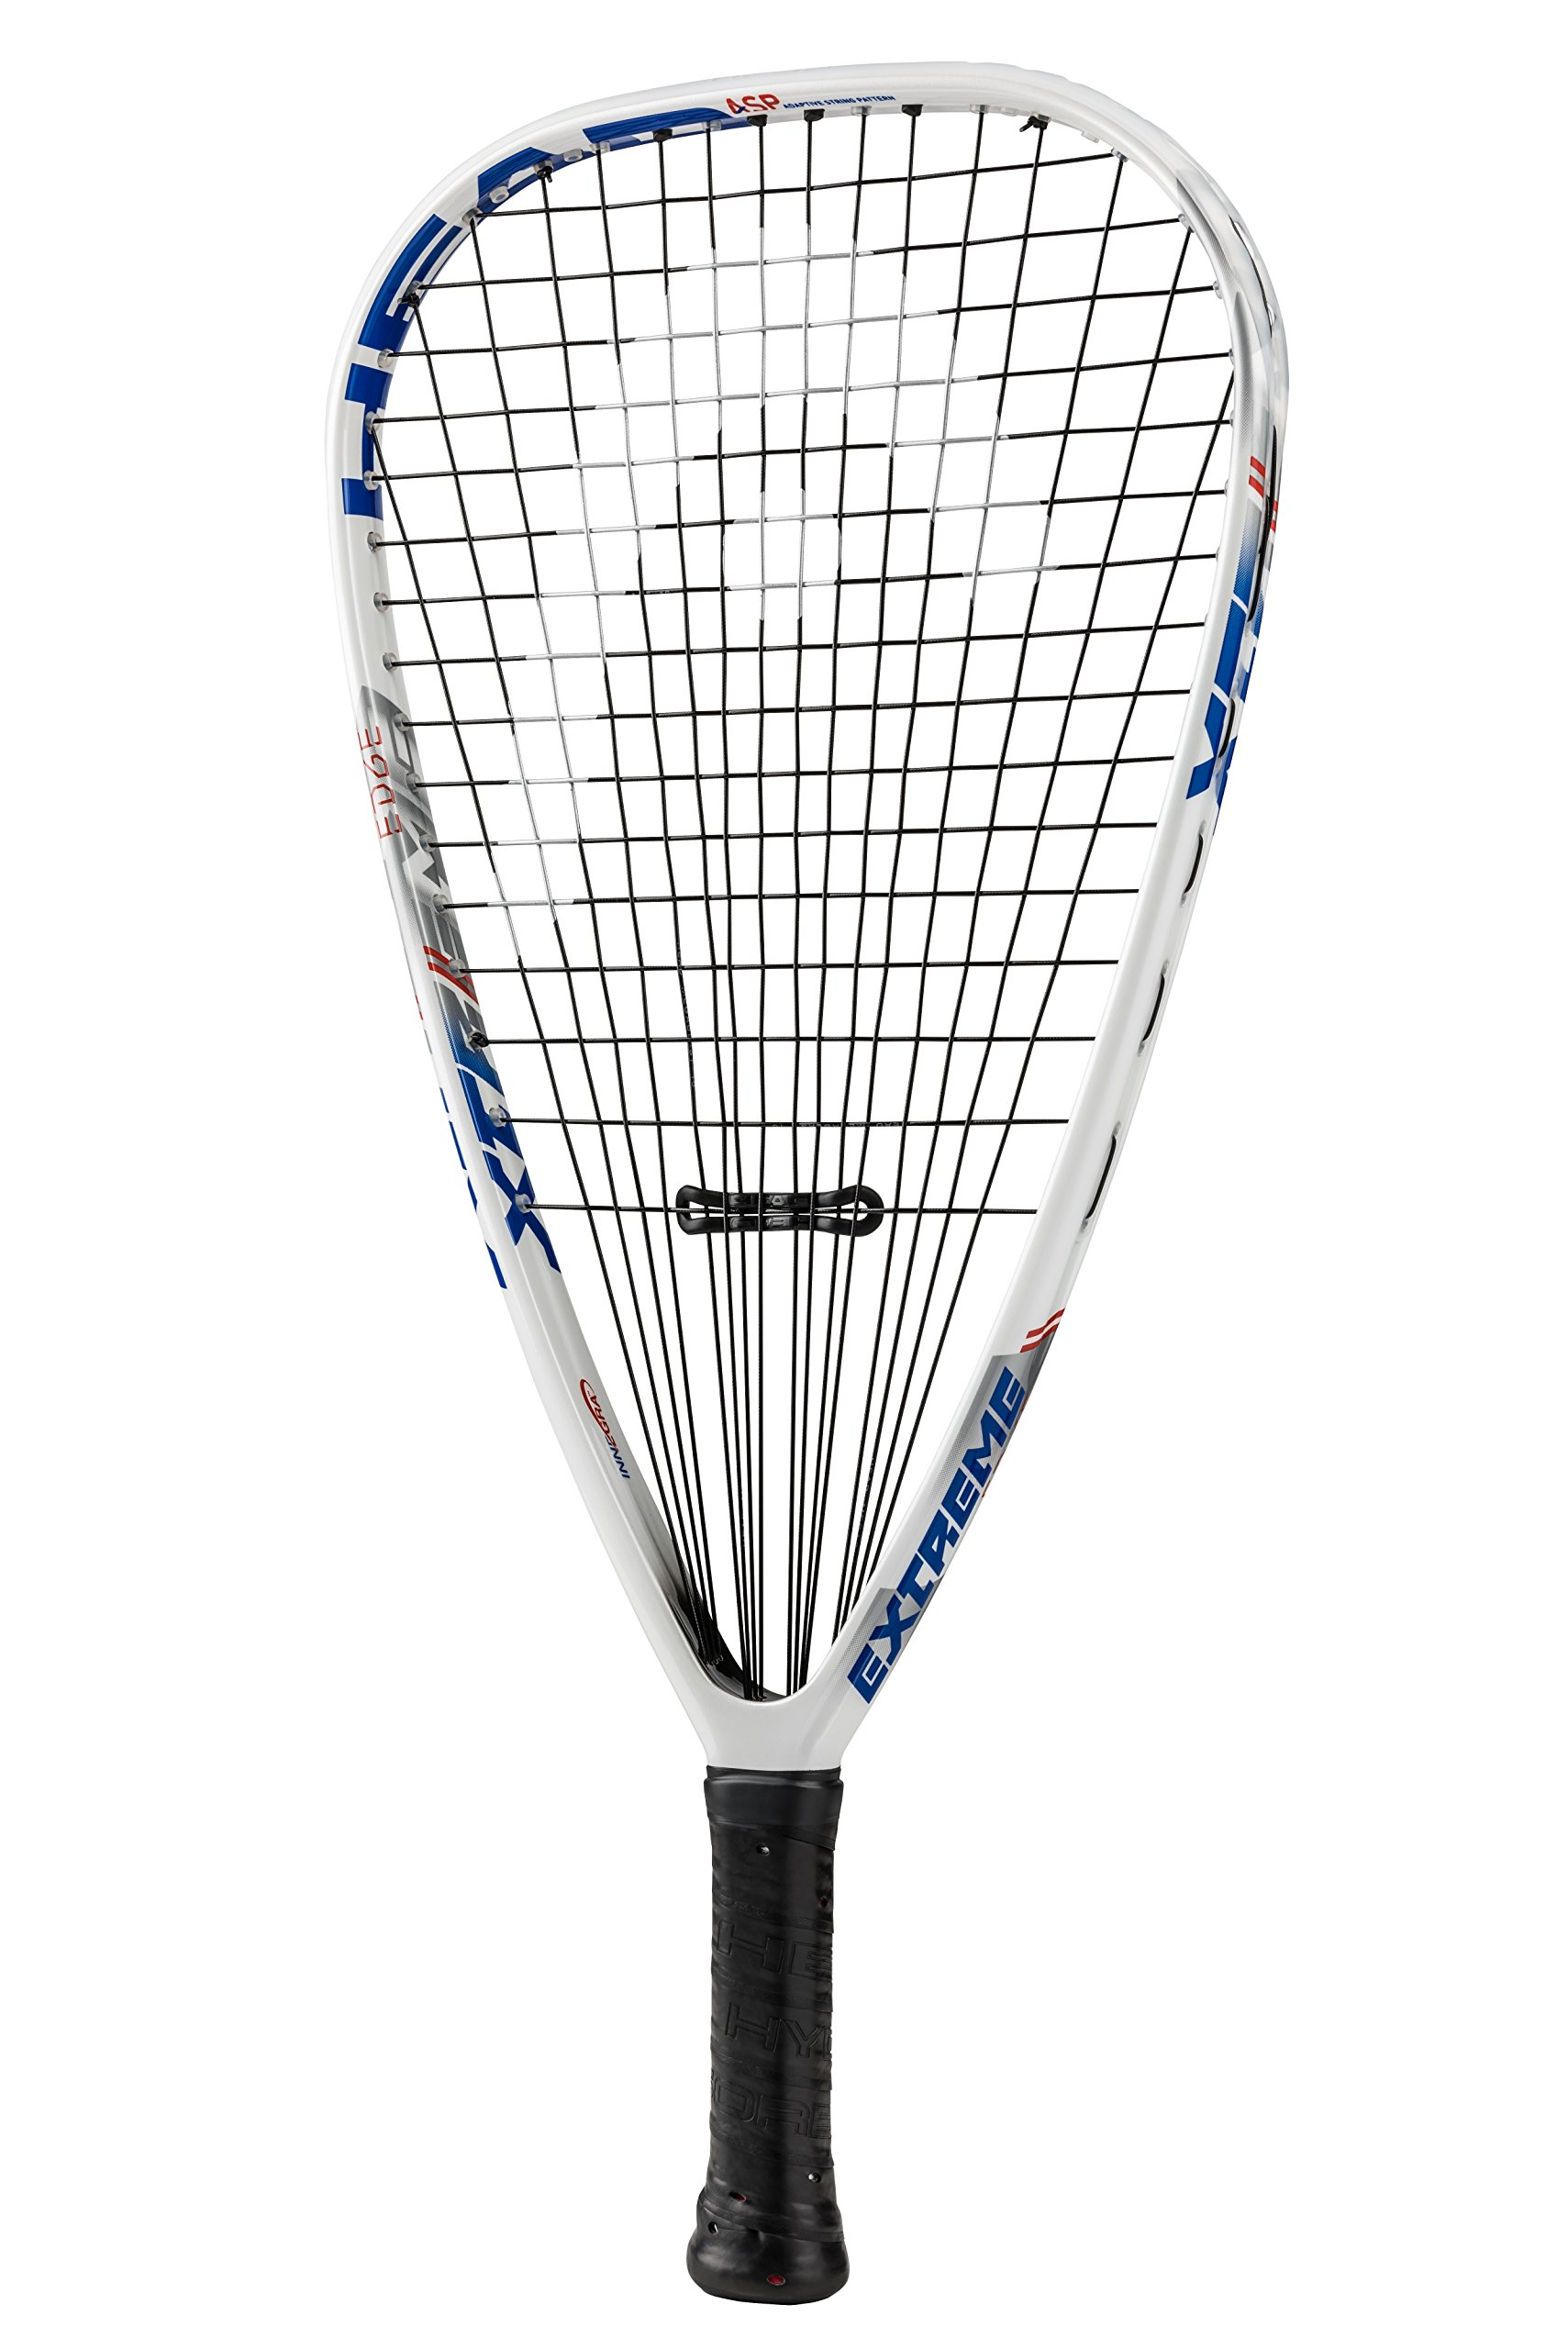 HEAD Extreme Edge Racquetball Racquet, Strung, 3 5/8 Inch Grip